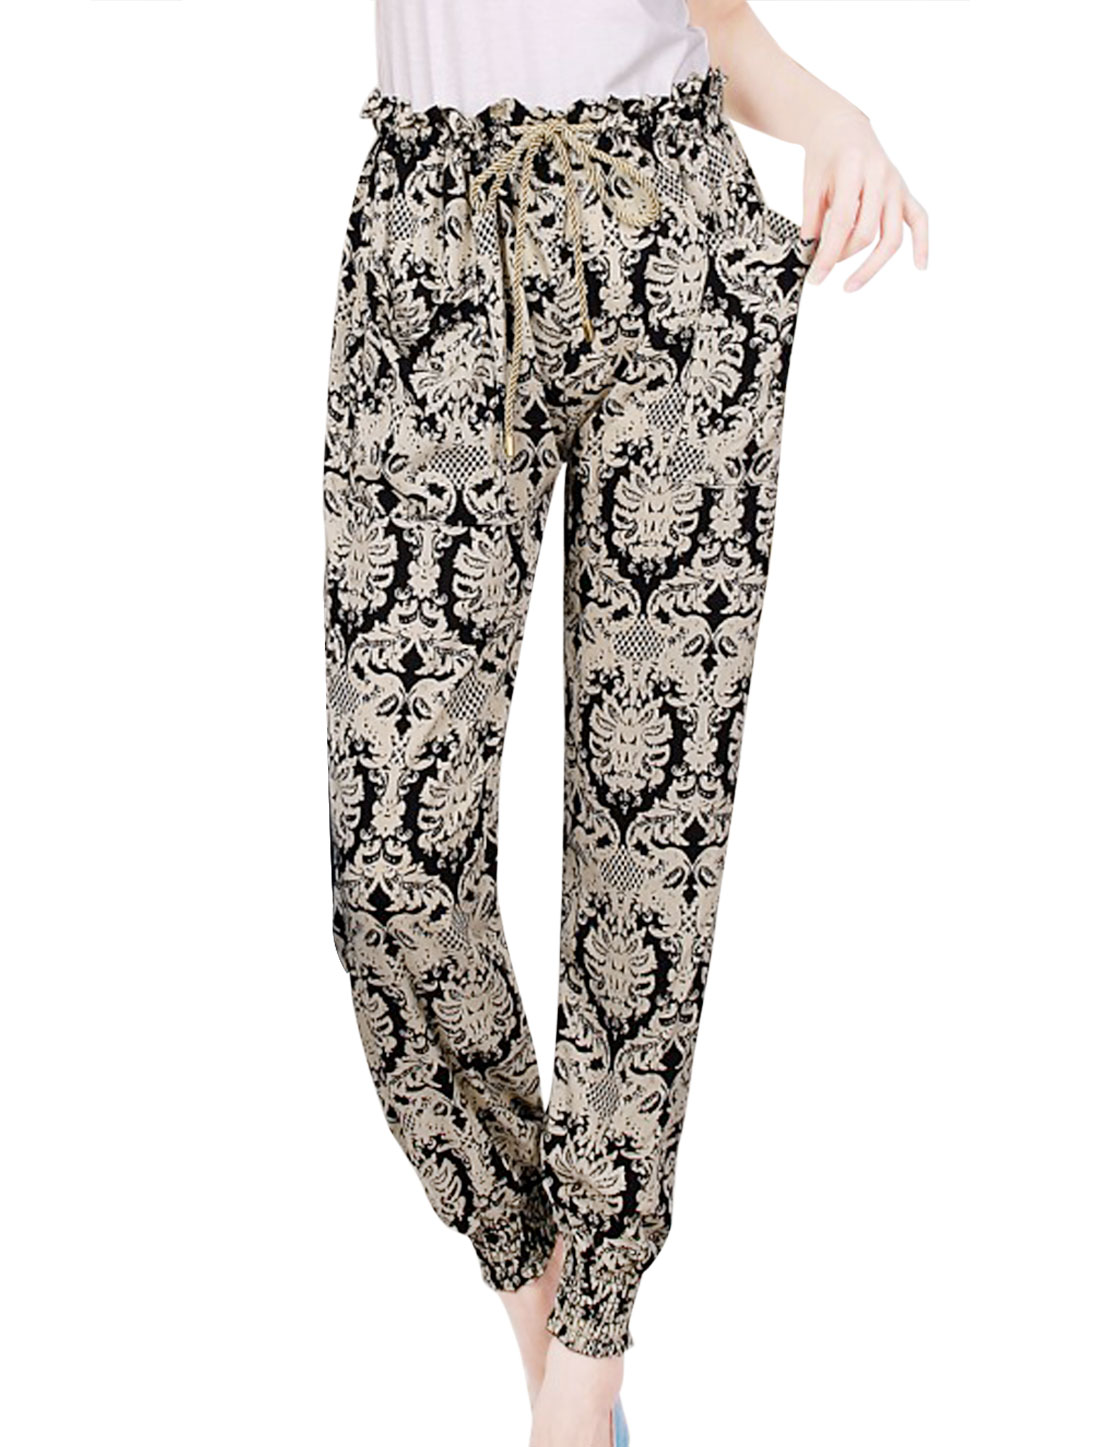 Ladies Drawstring Waist Allover Spider Pattern Jogger Pants Beige Black XS